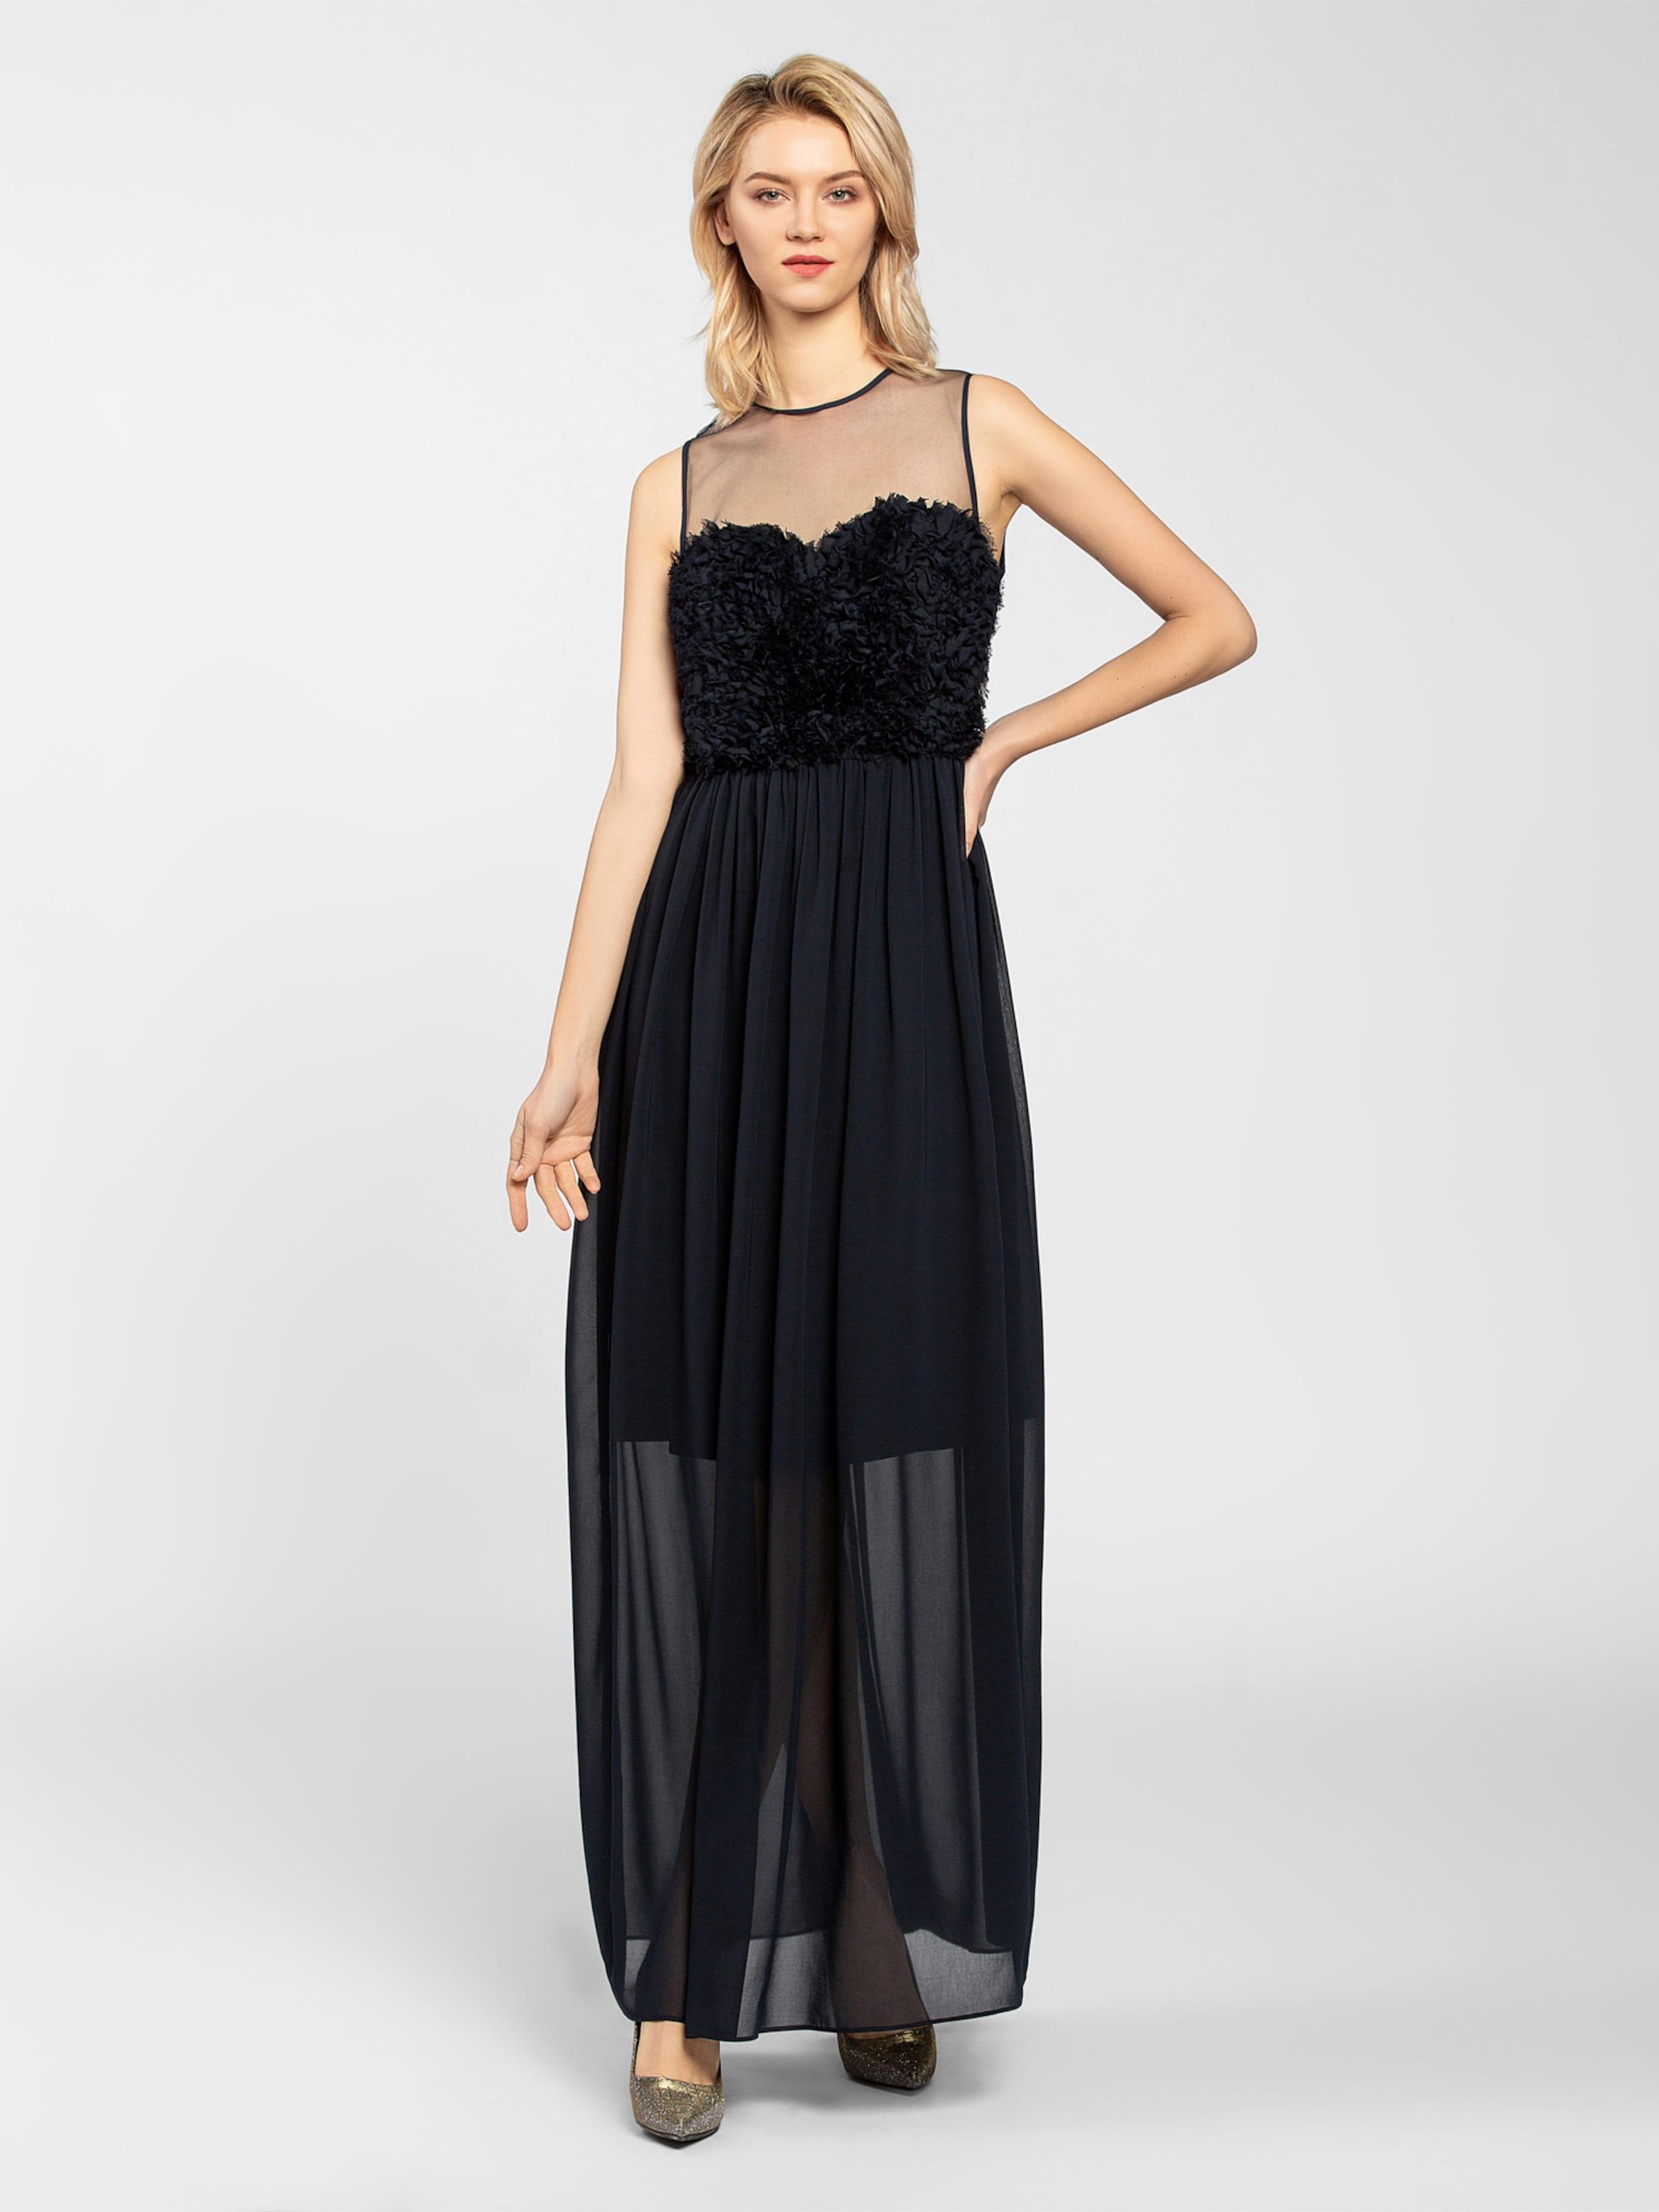 Nachtblau Apart Kleid In Kleid Apart 4LA35Rjq